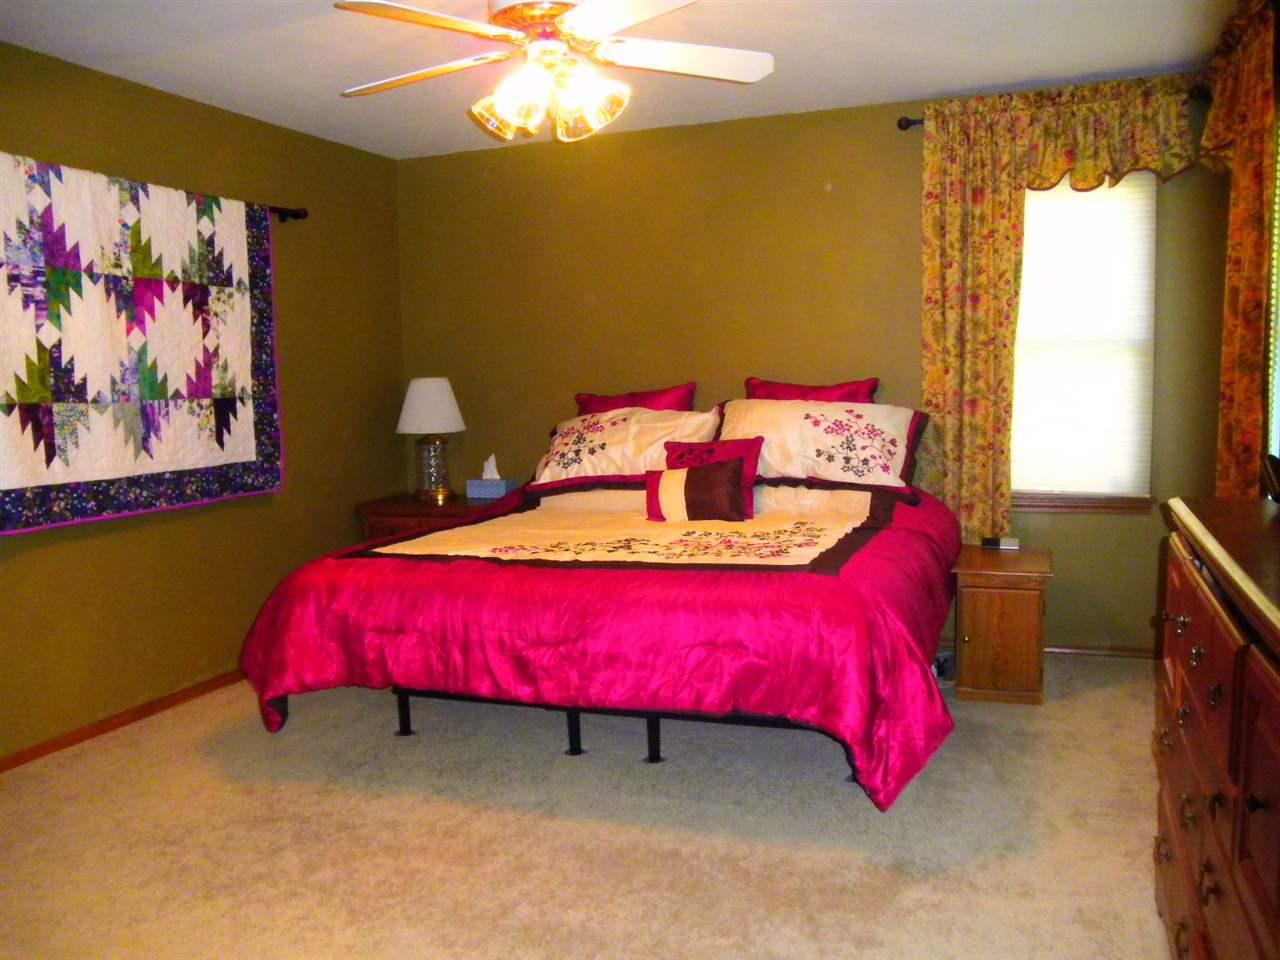 Sold Cross Sale W/ MLS | 32 Raintree Ponca City, OK 74604 16